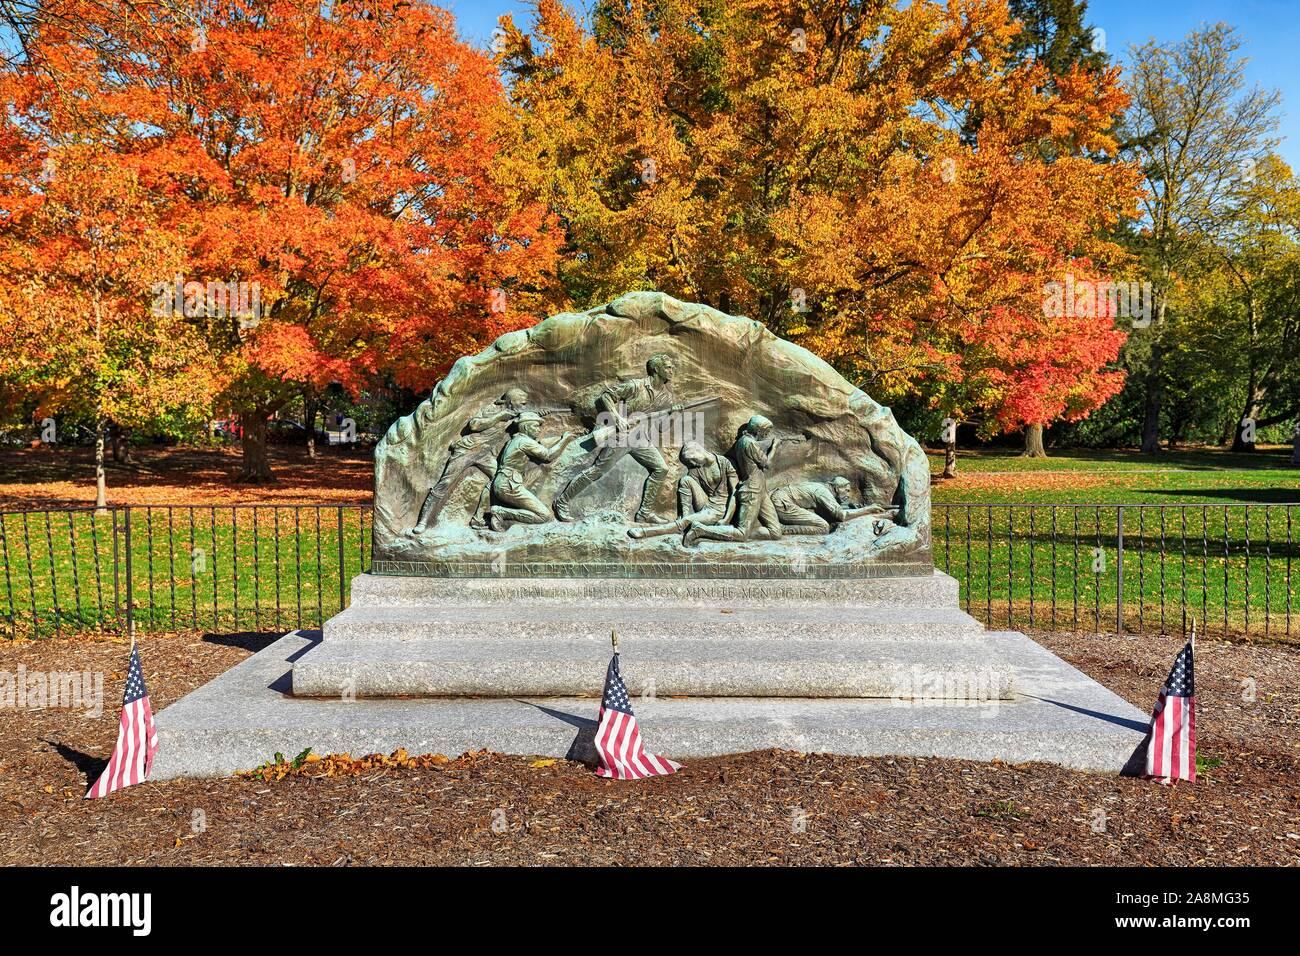 Tumba monumento a la guerra de la independencia americana, Lexington Battle Green, Lexington, Massachusetts, EE.UU. Foto de stock